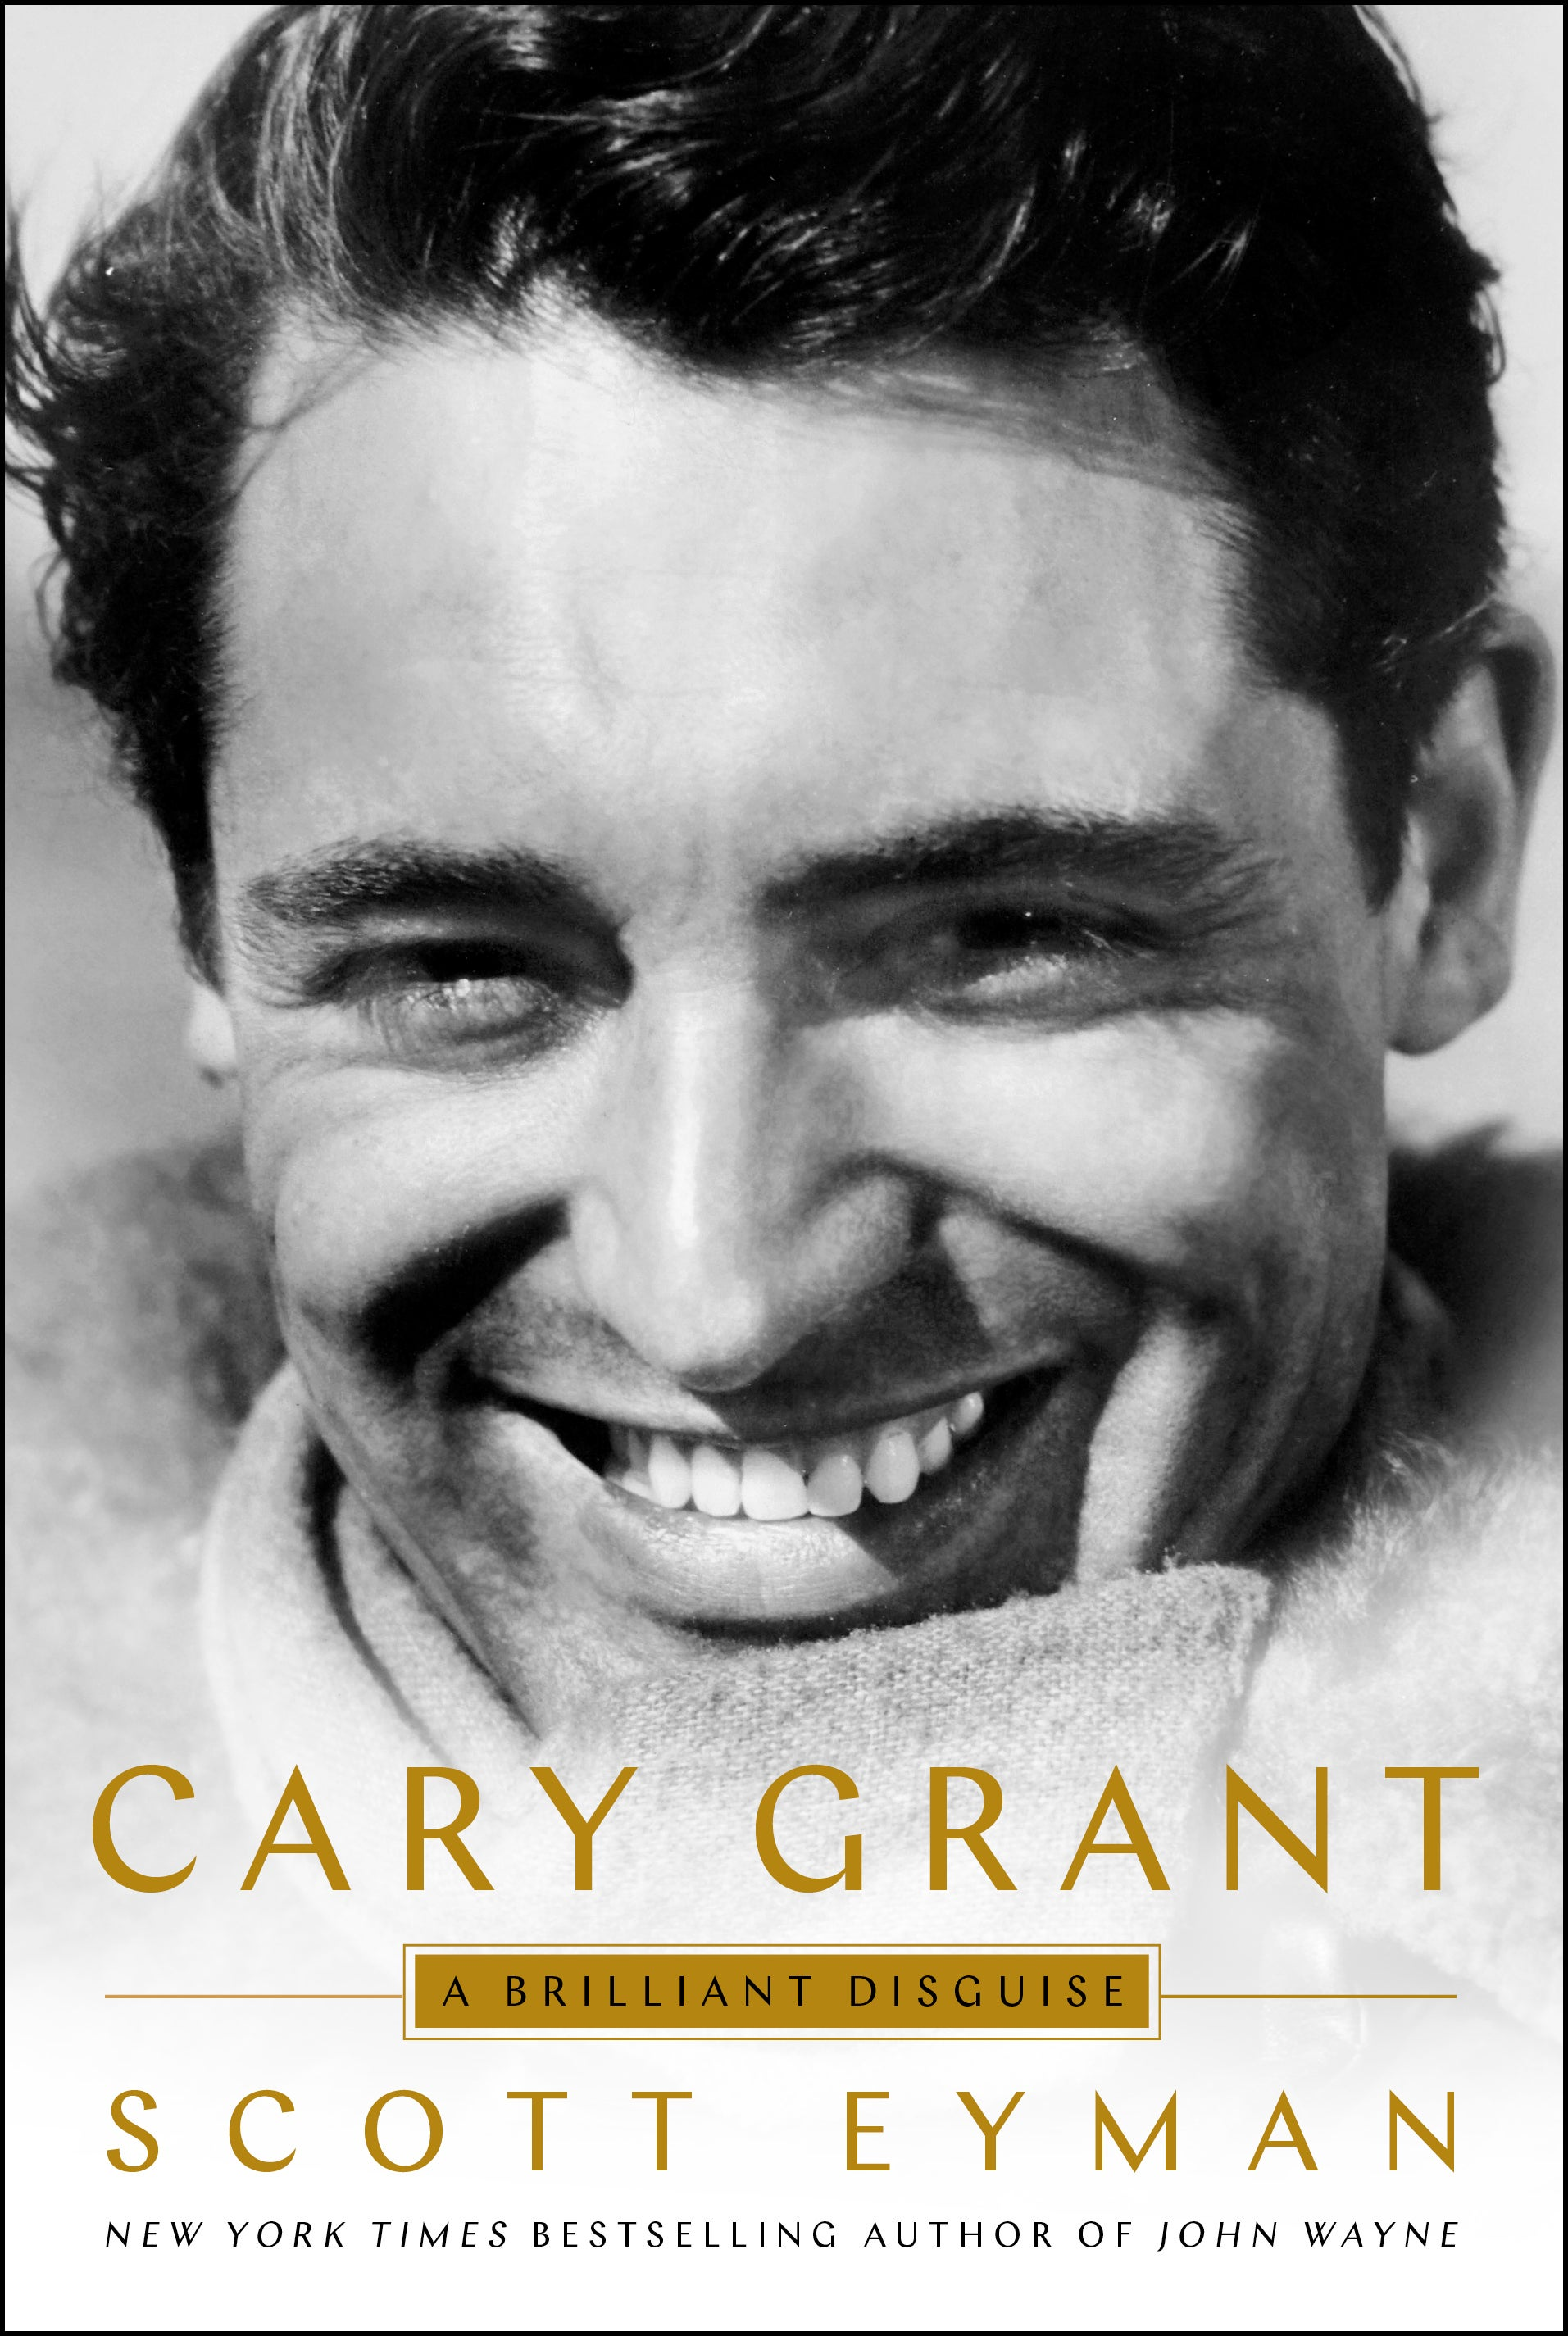 Review: Cary Grant bio a perceptive look at captivating star